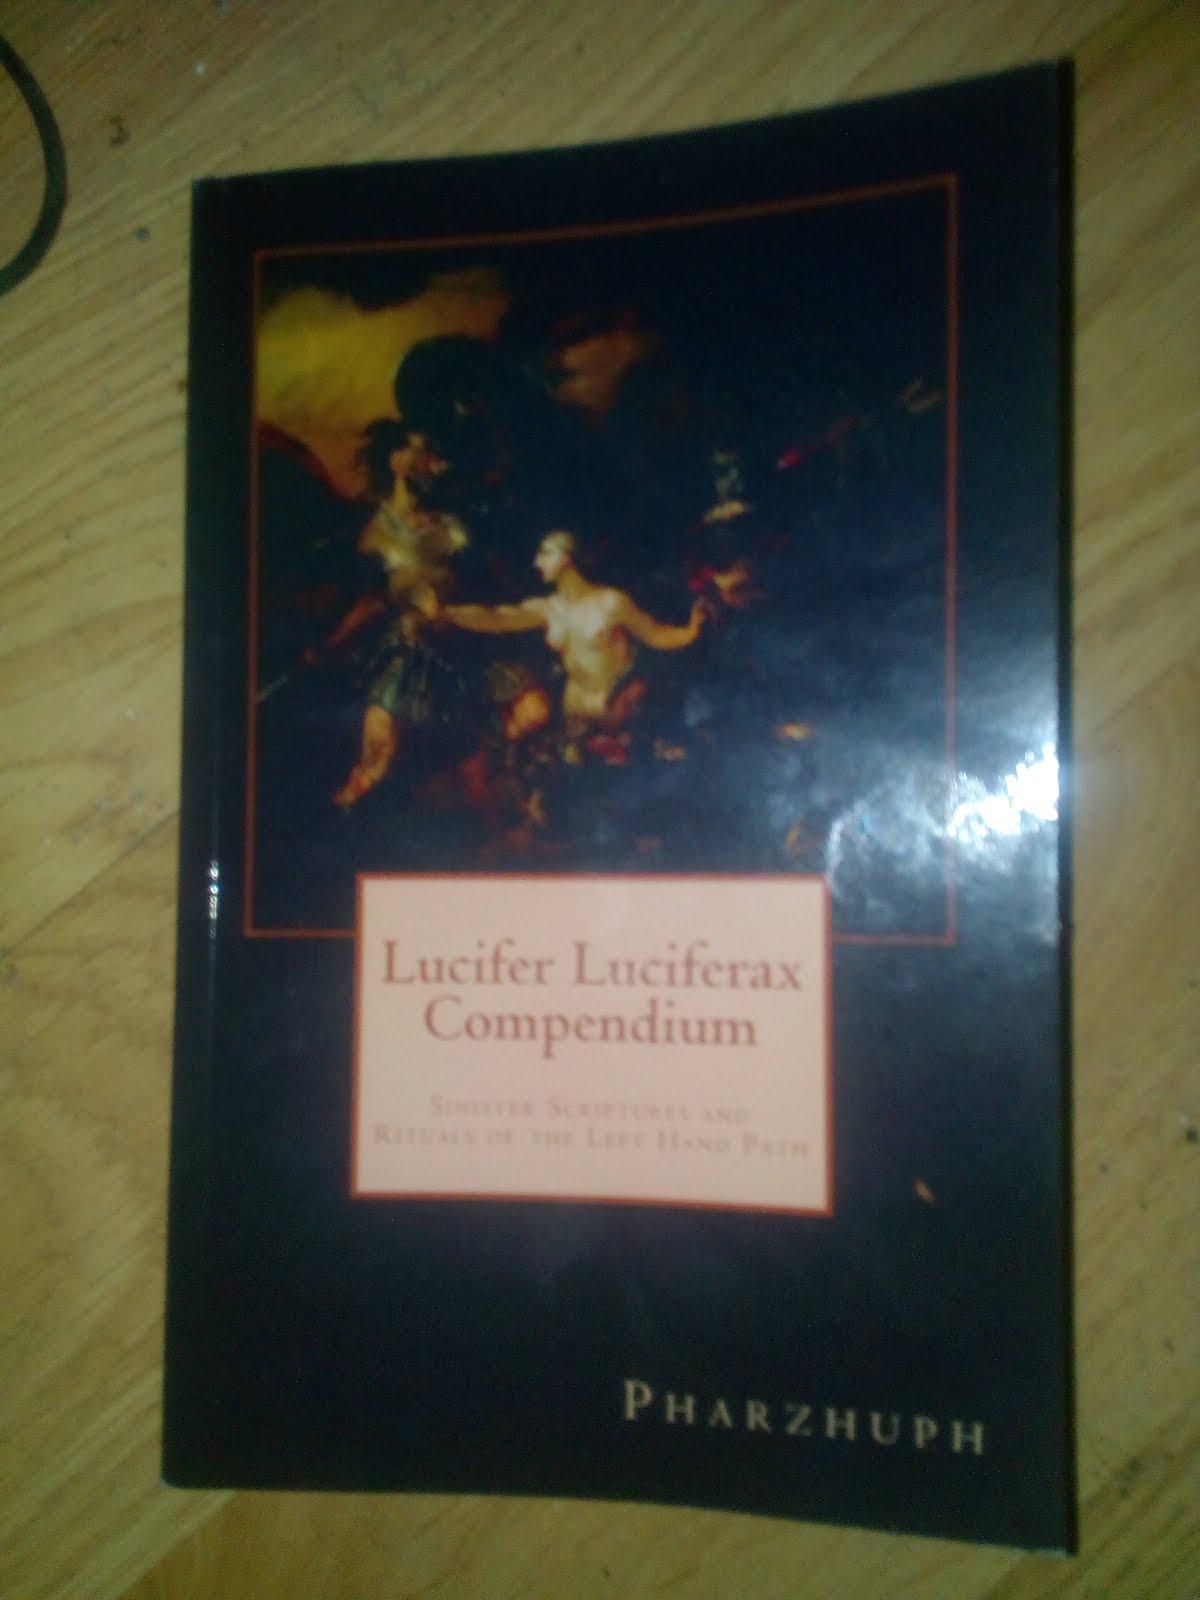 'Lucifer Luciferax Compendium' by Pharzhuph.